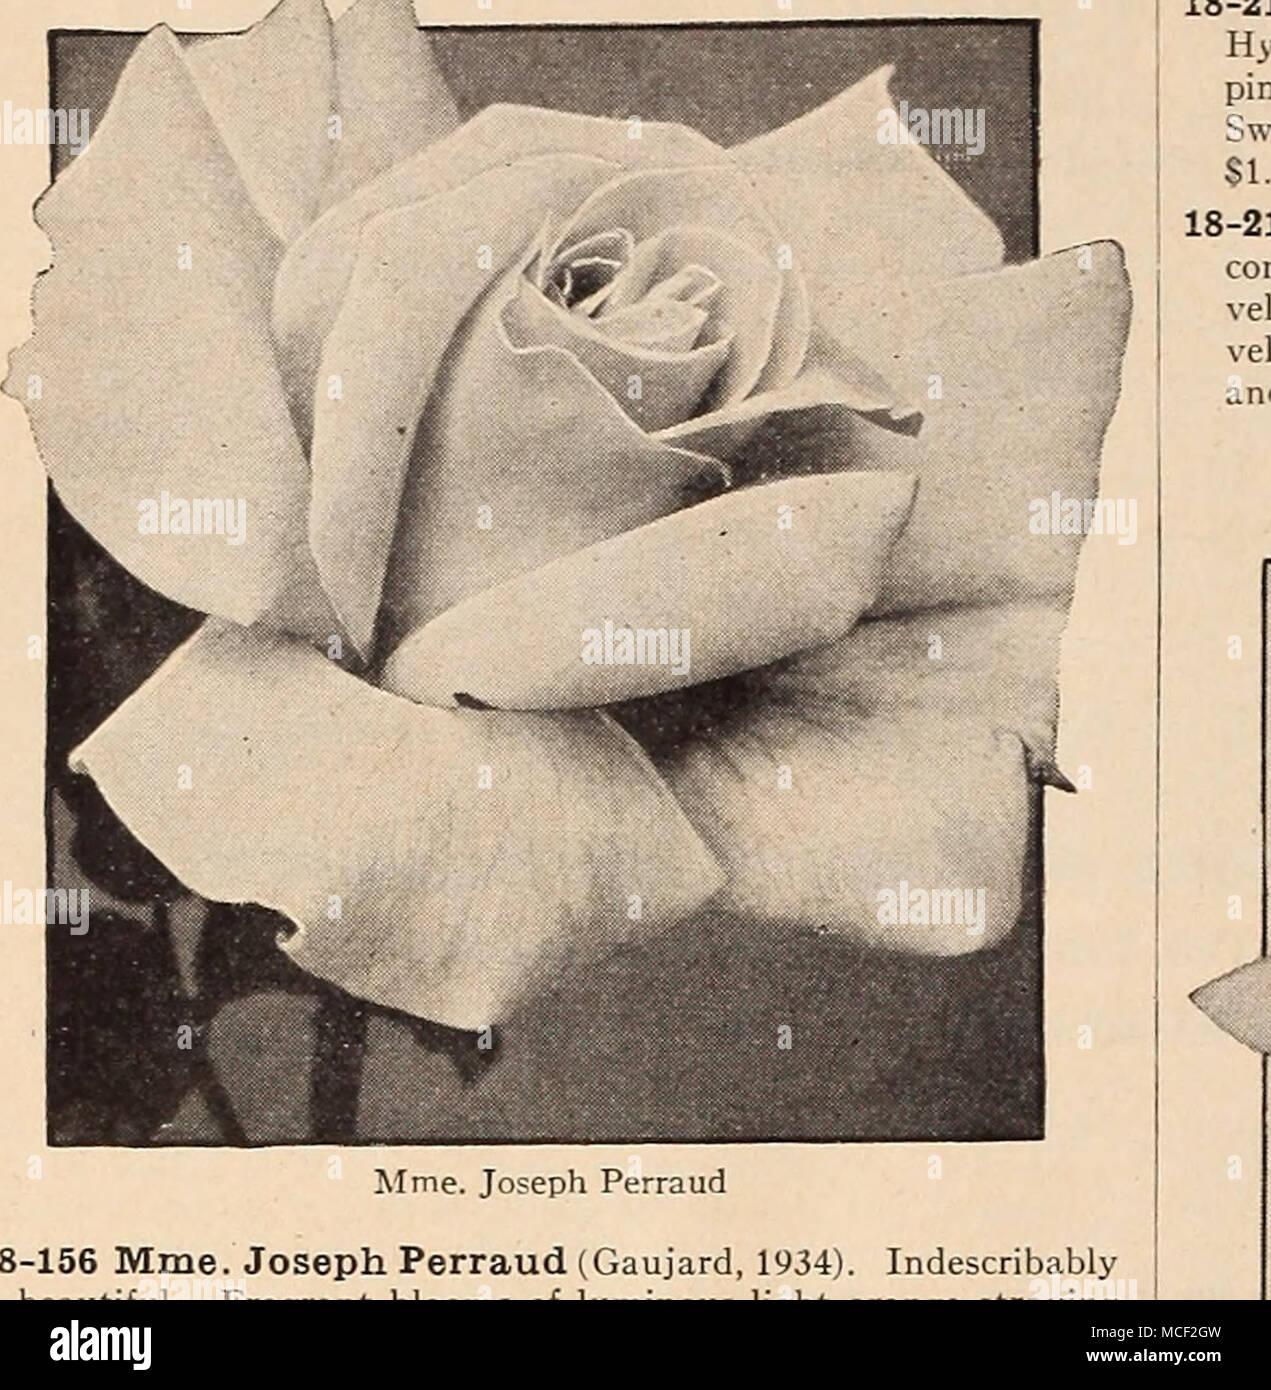 18 156 mme joseph perraud gaujard 1934 indescribably beautiful 18 156 mme joseph perraud gaujard 1934 indescribably beautiful izmirmasajfo